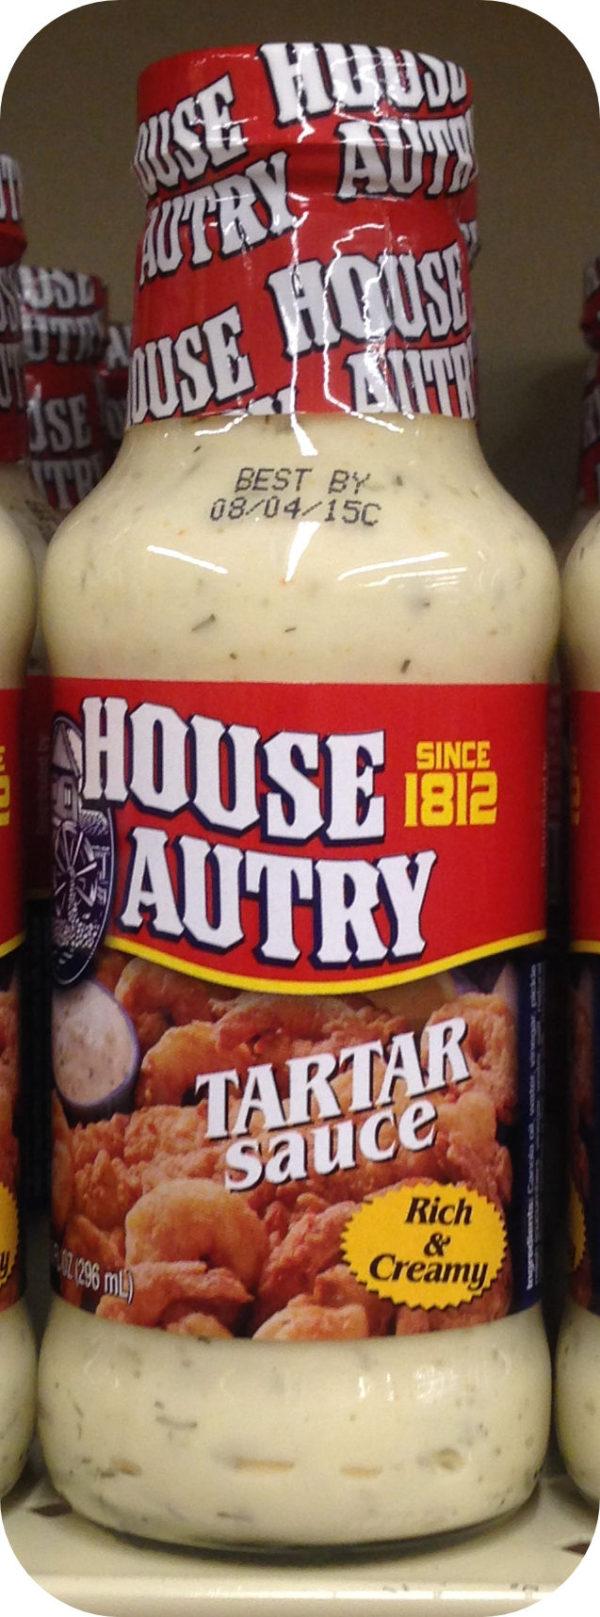 House Autry Tartar Sauce 11.5 Oz shrimp clams oysters crab cakes fish burgers-0